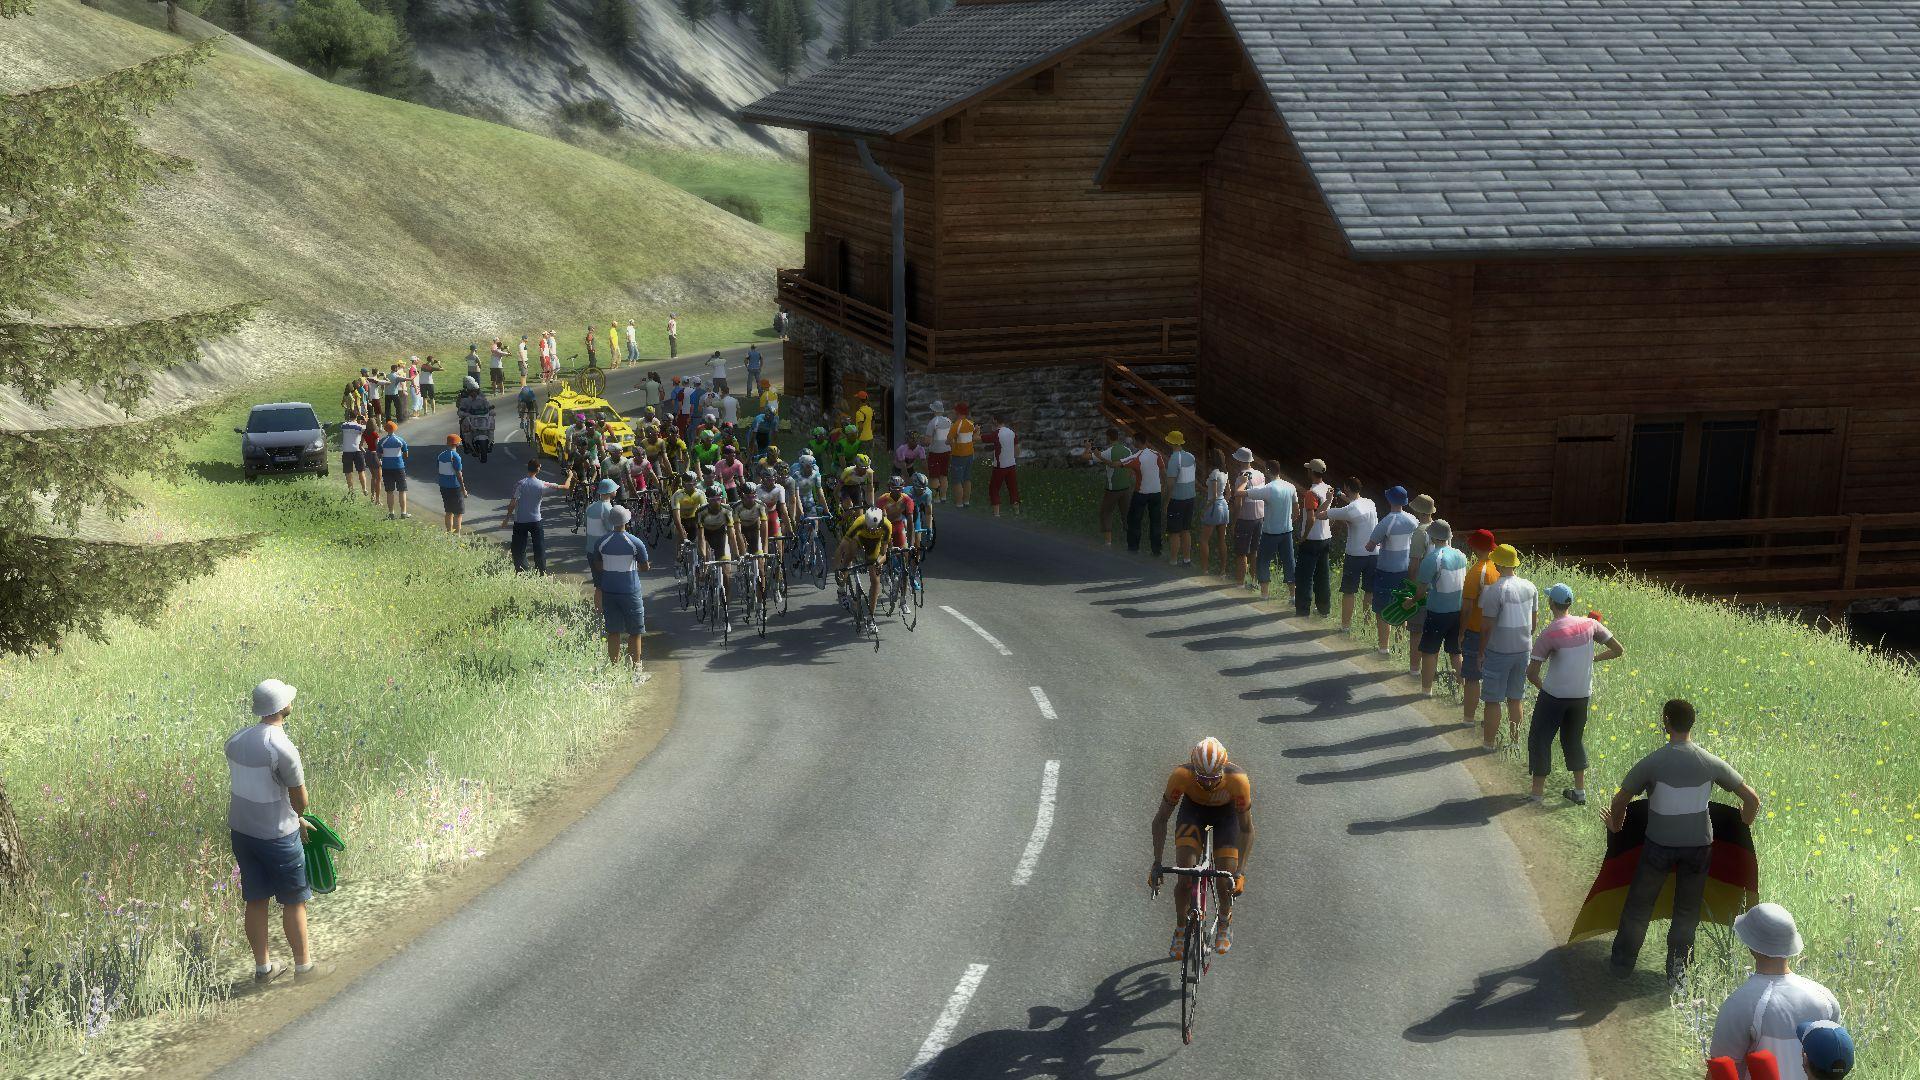 pcmdaily.com/images/mg/2017/Races/U23/Avenir/AVES7%2017.jpg